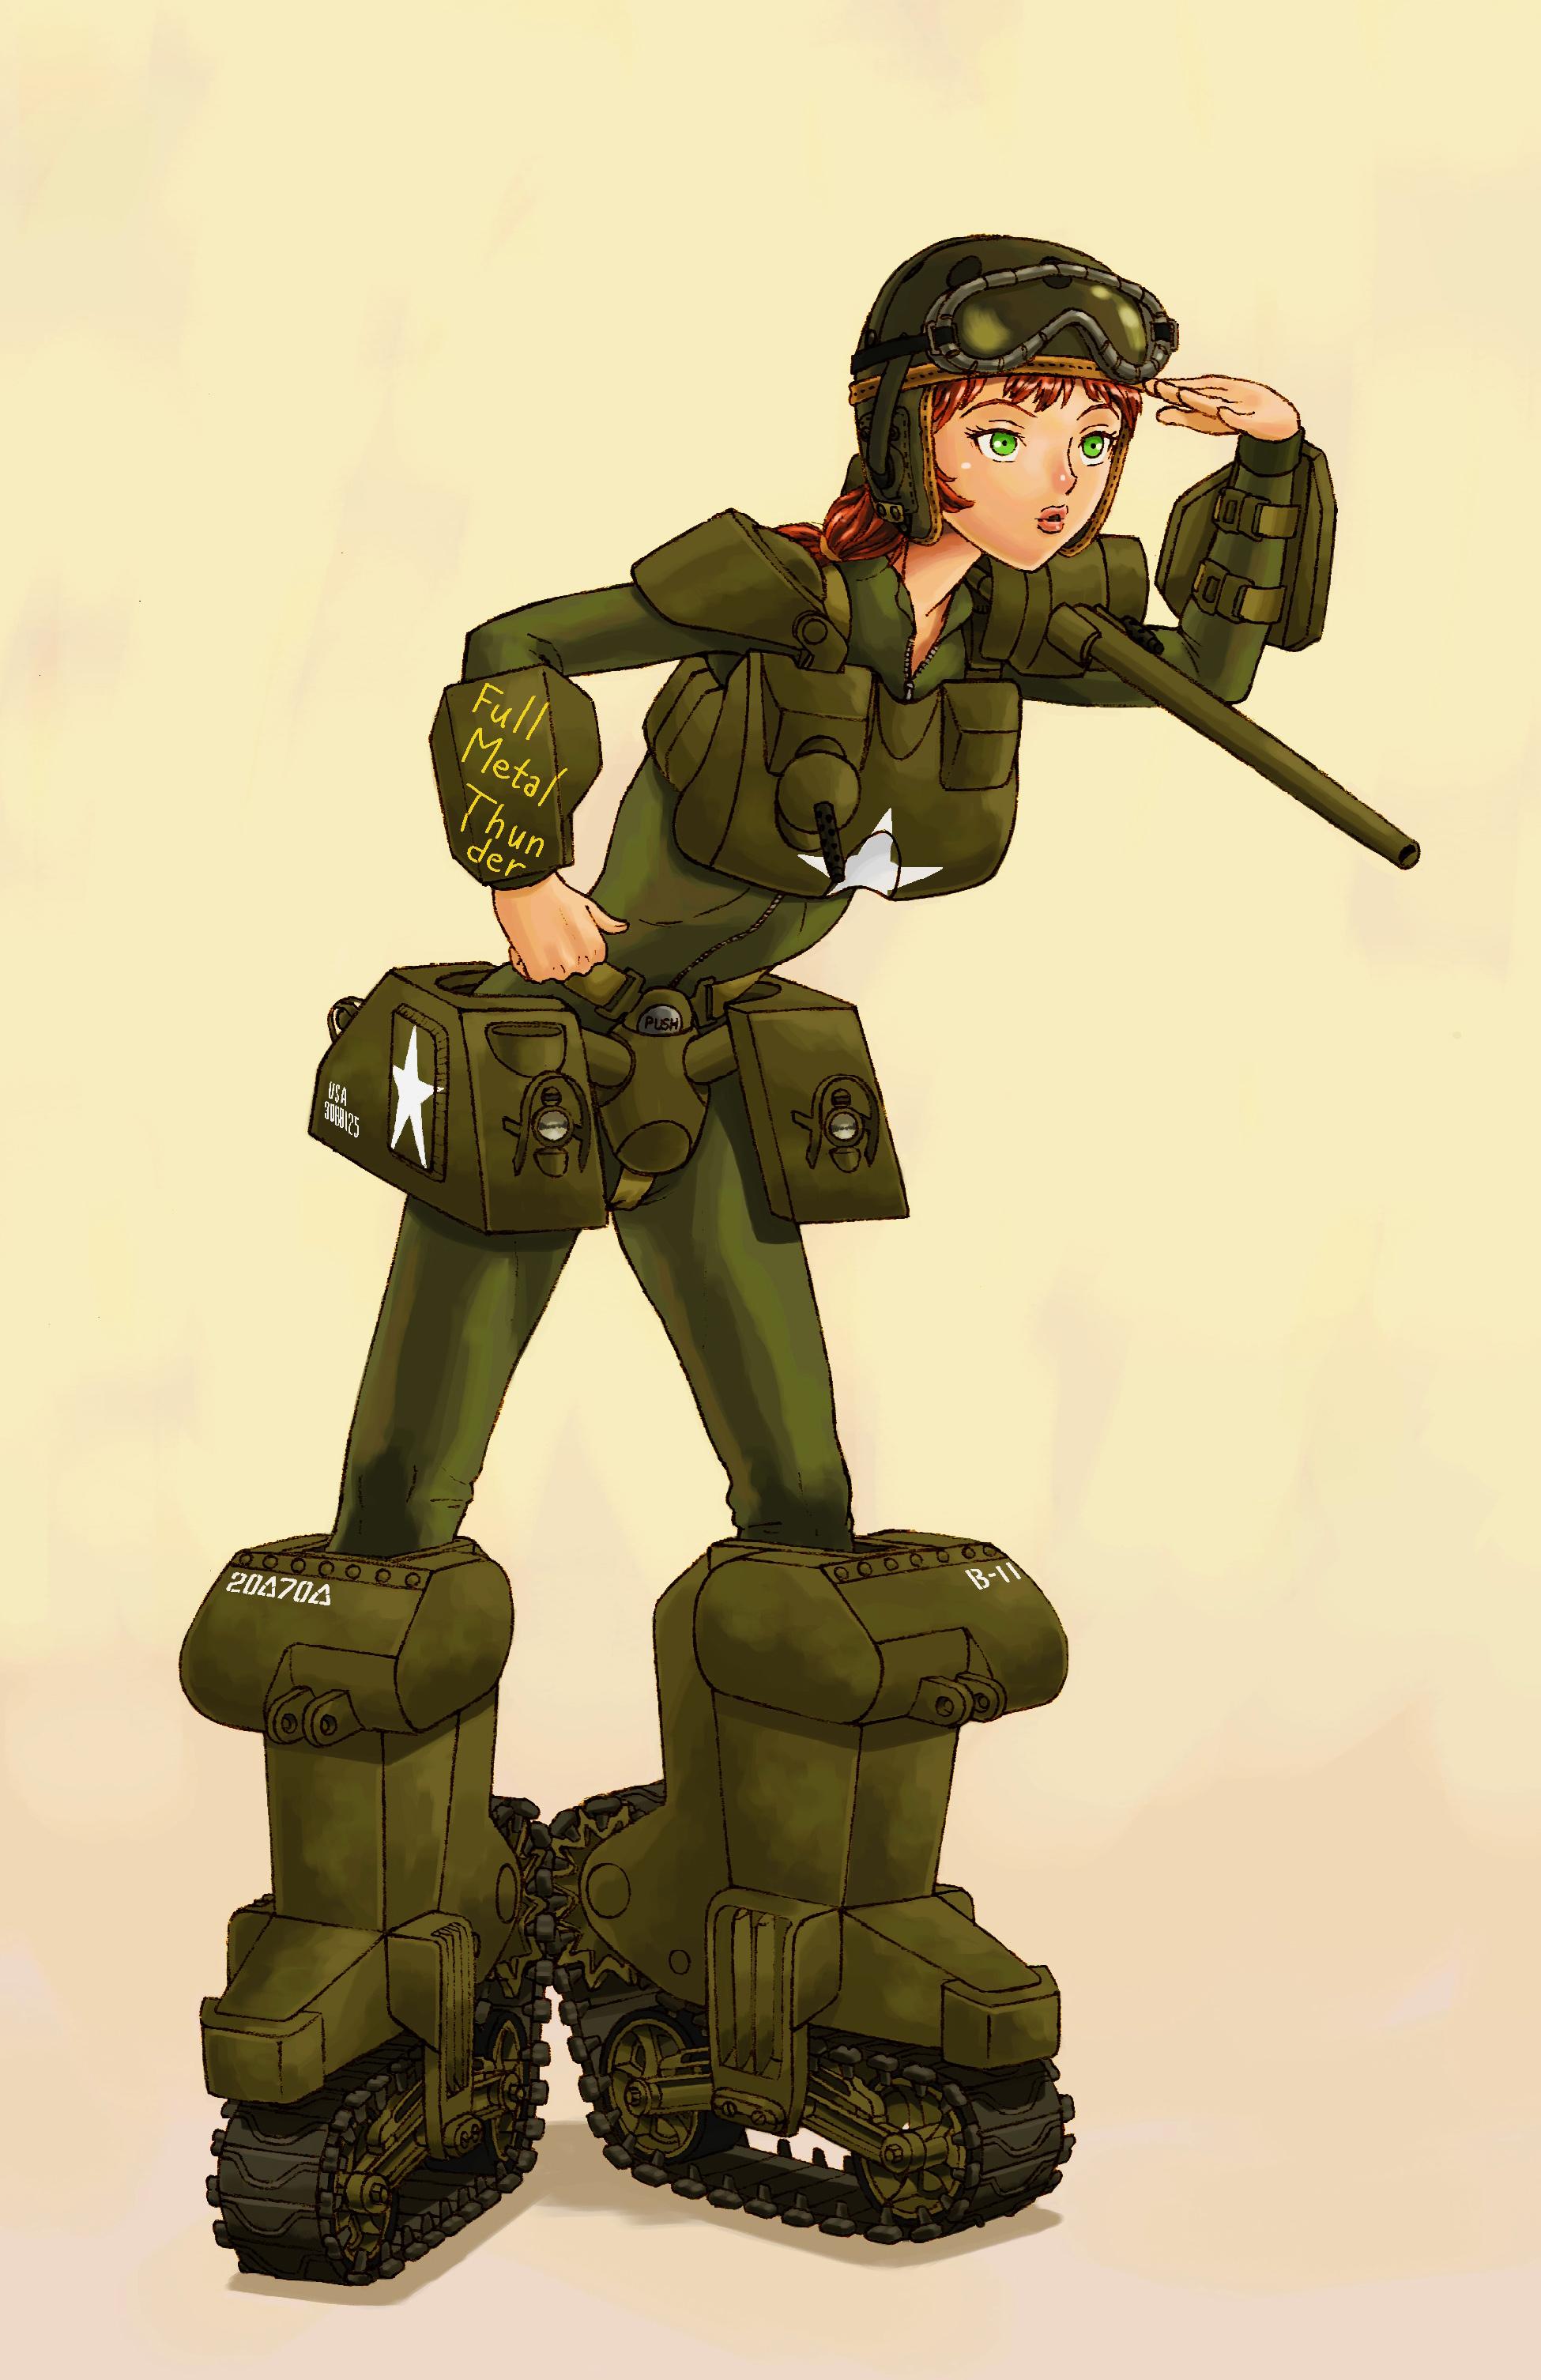 minecraft skin wallpaper girl